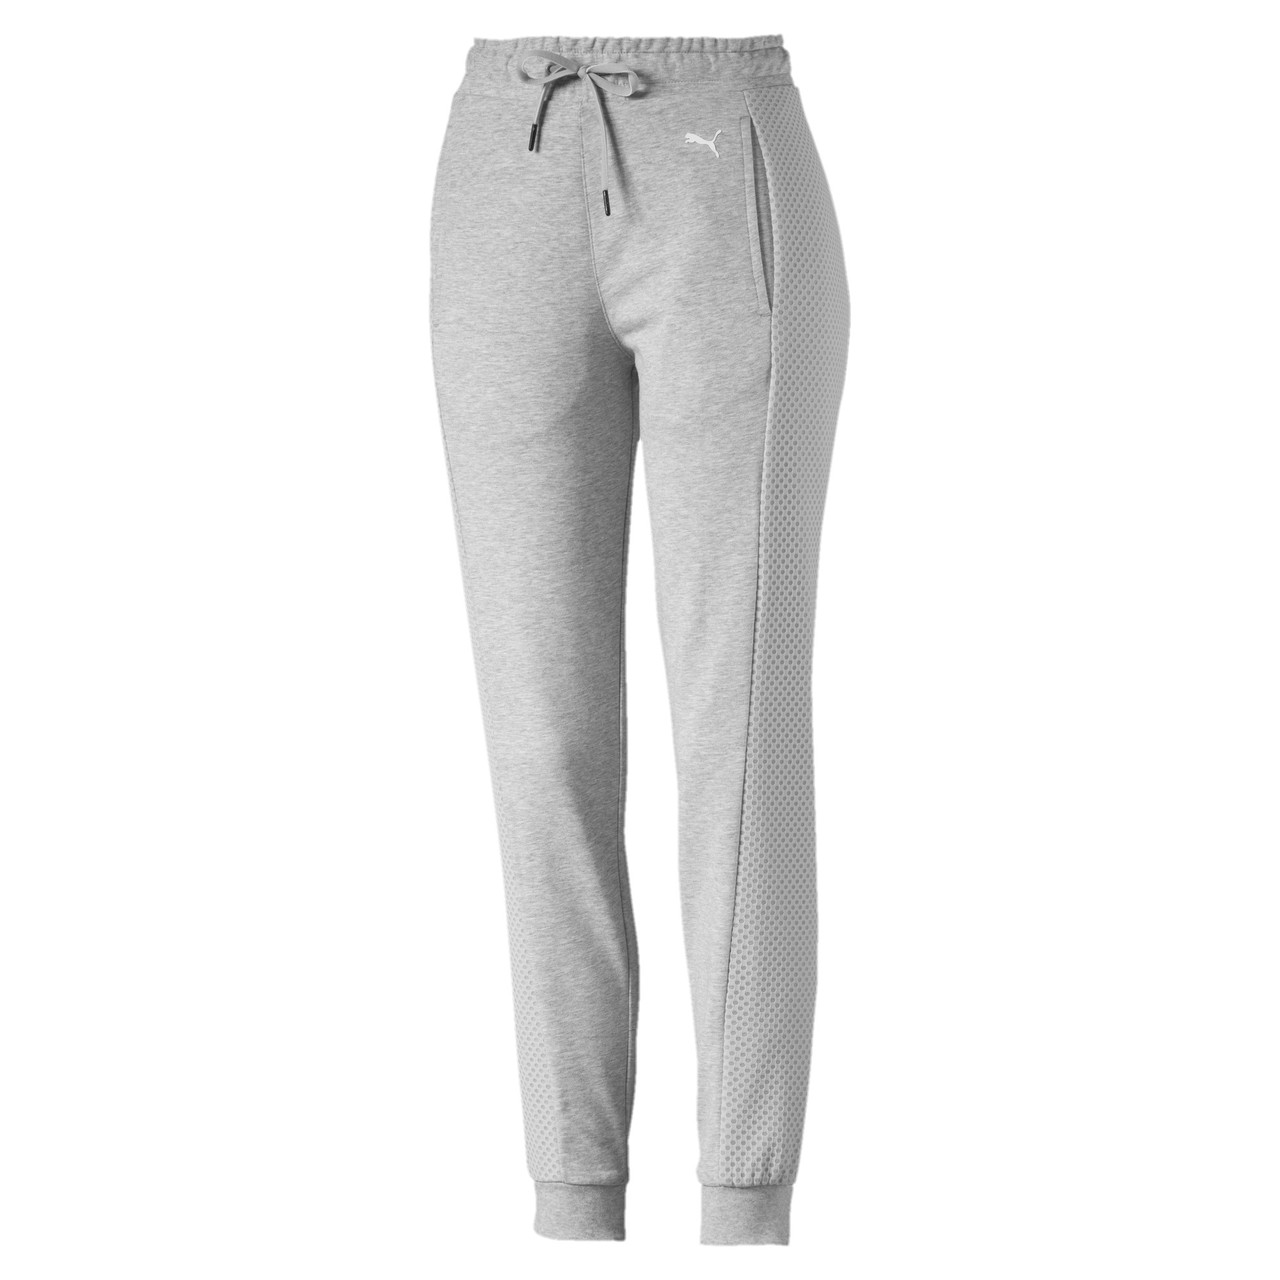 Женские спортивные брюки Chase Pants